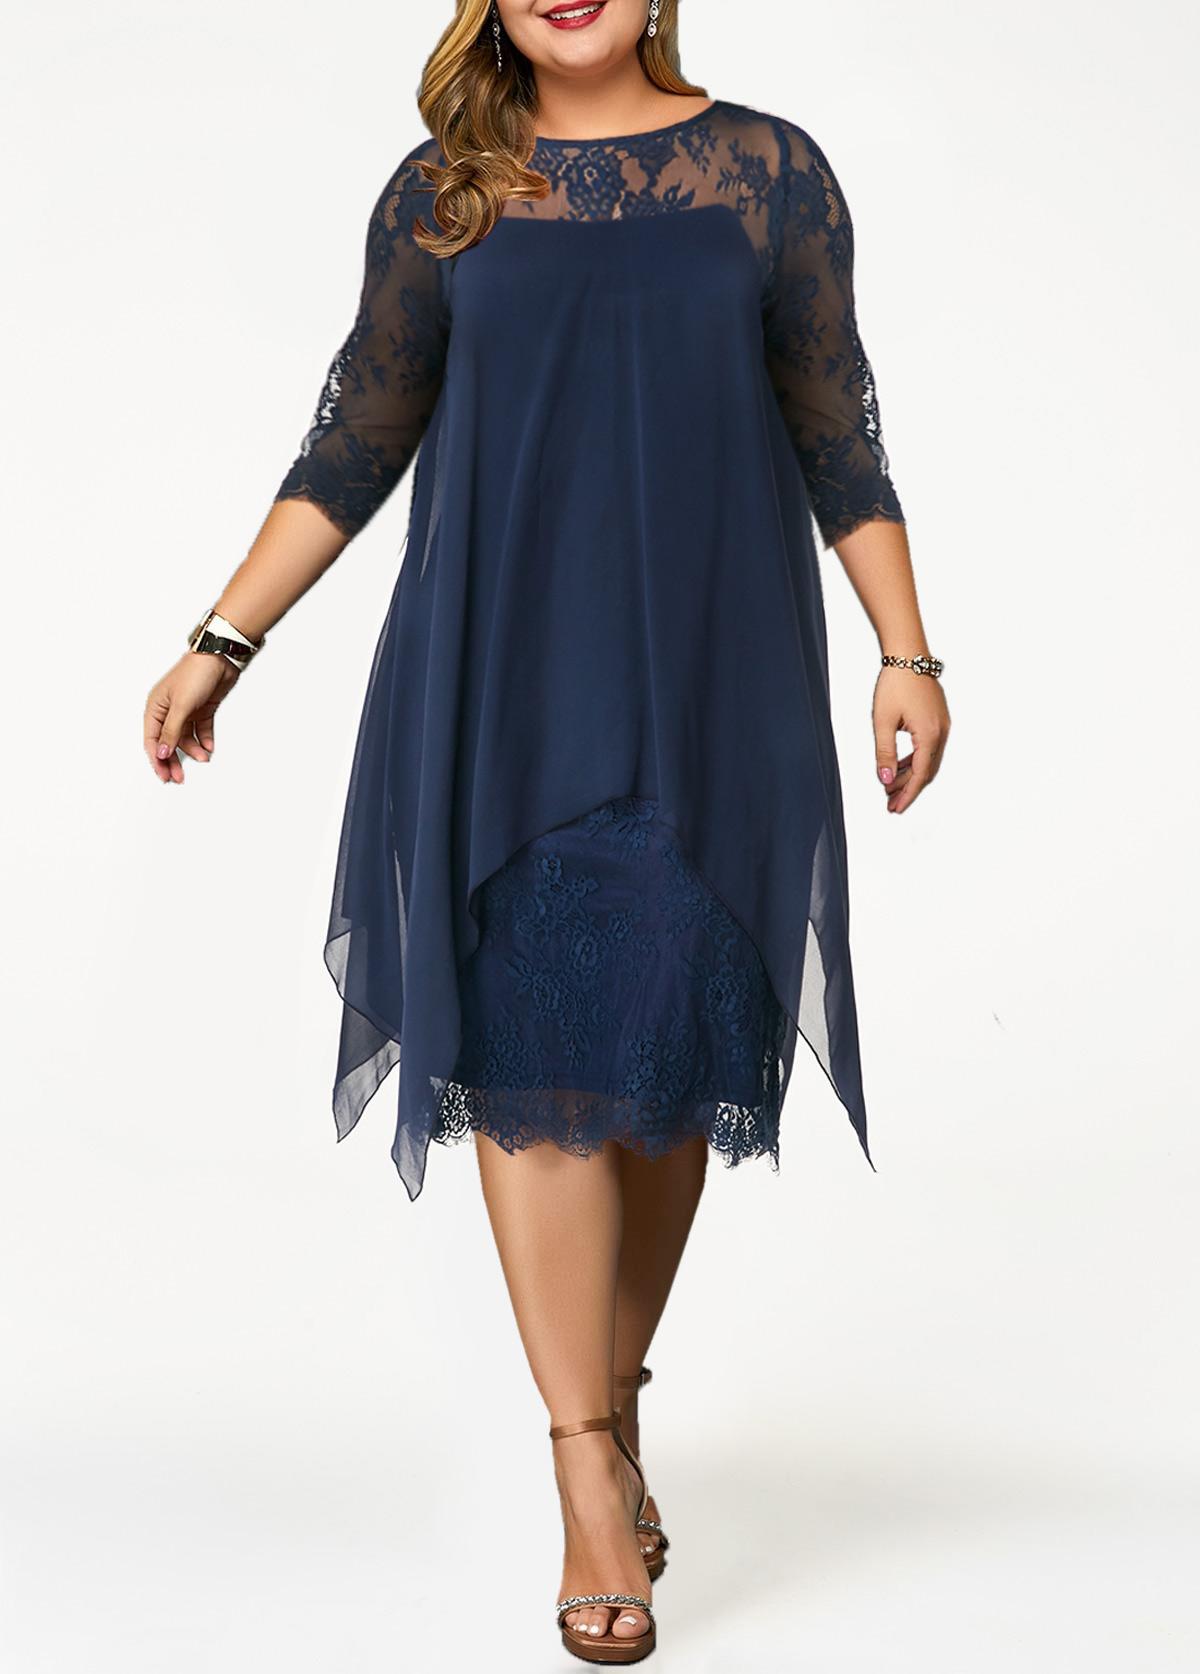 ROTITA Plus Size Lace Panel Overlay Navy Blue Dress